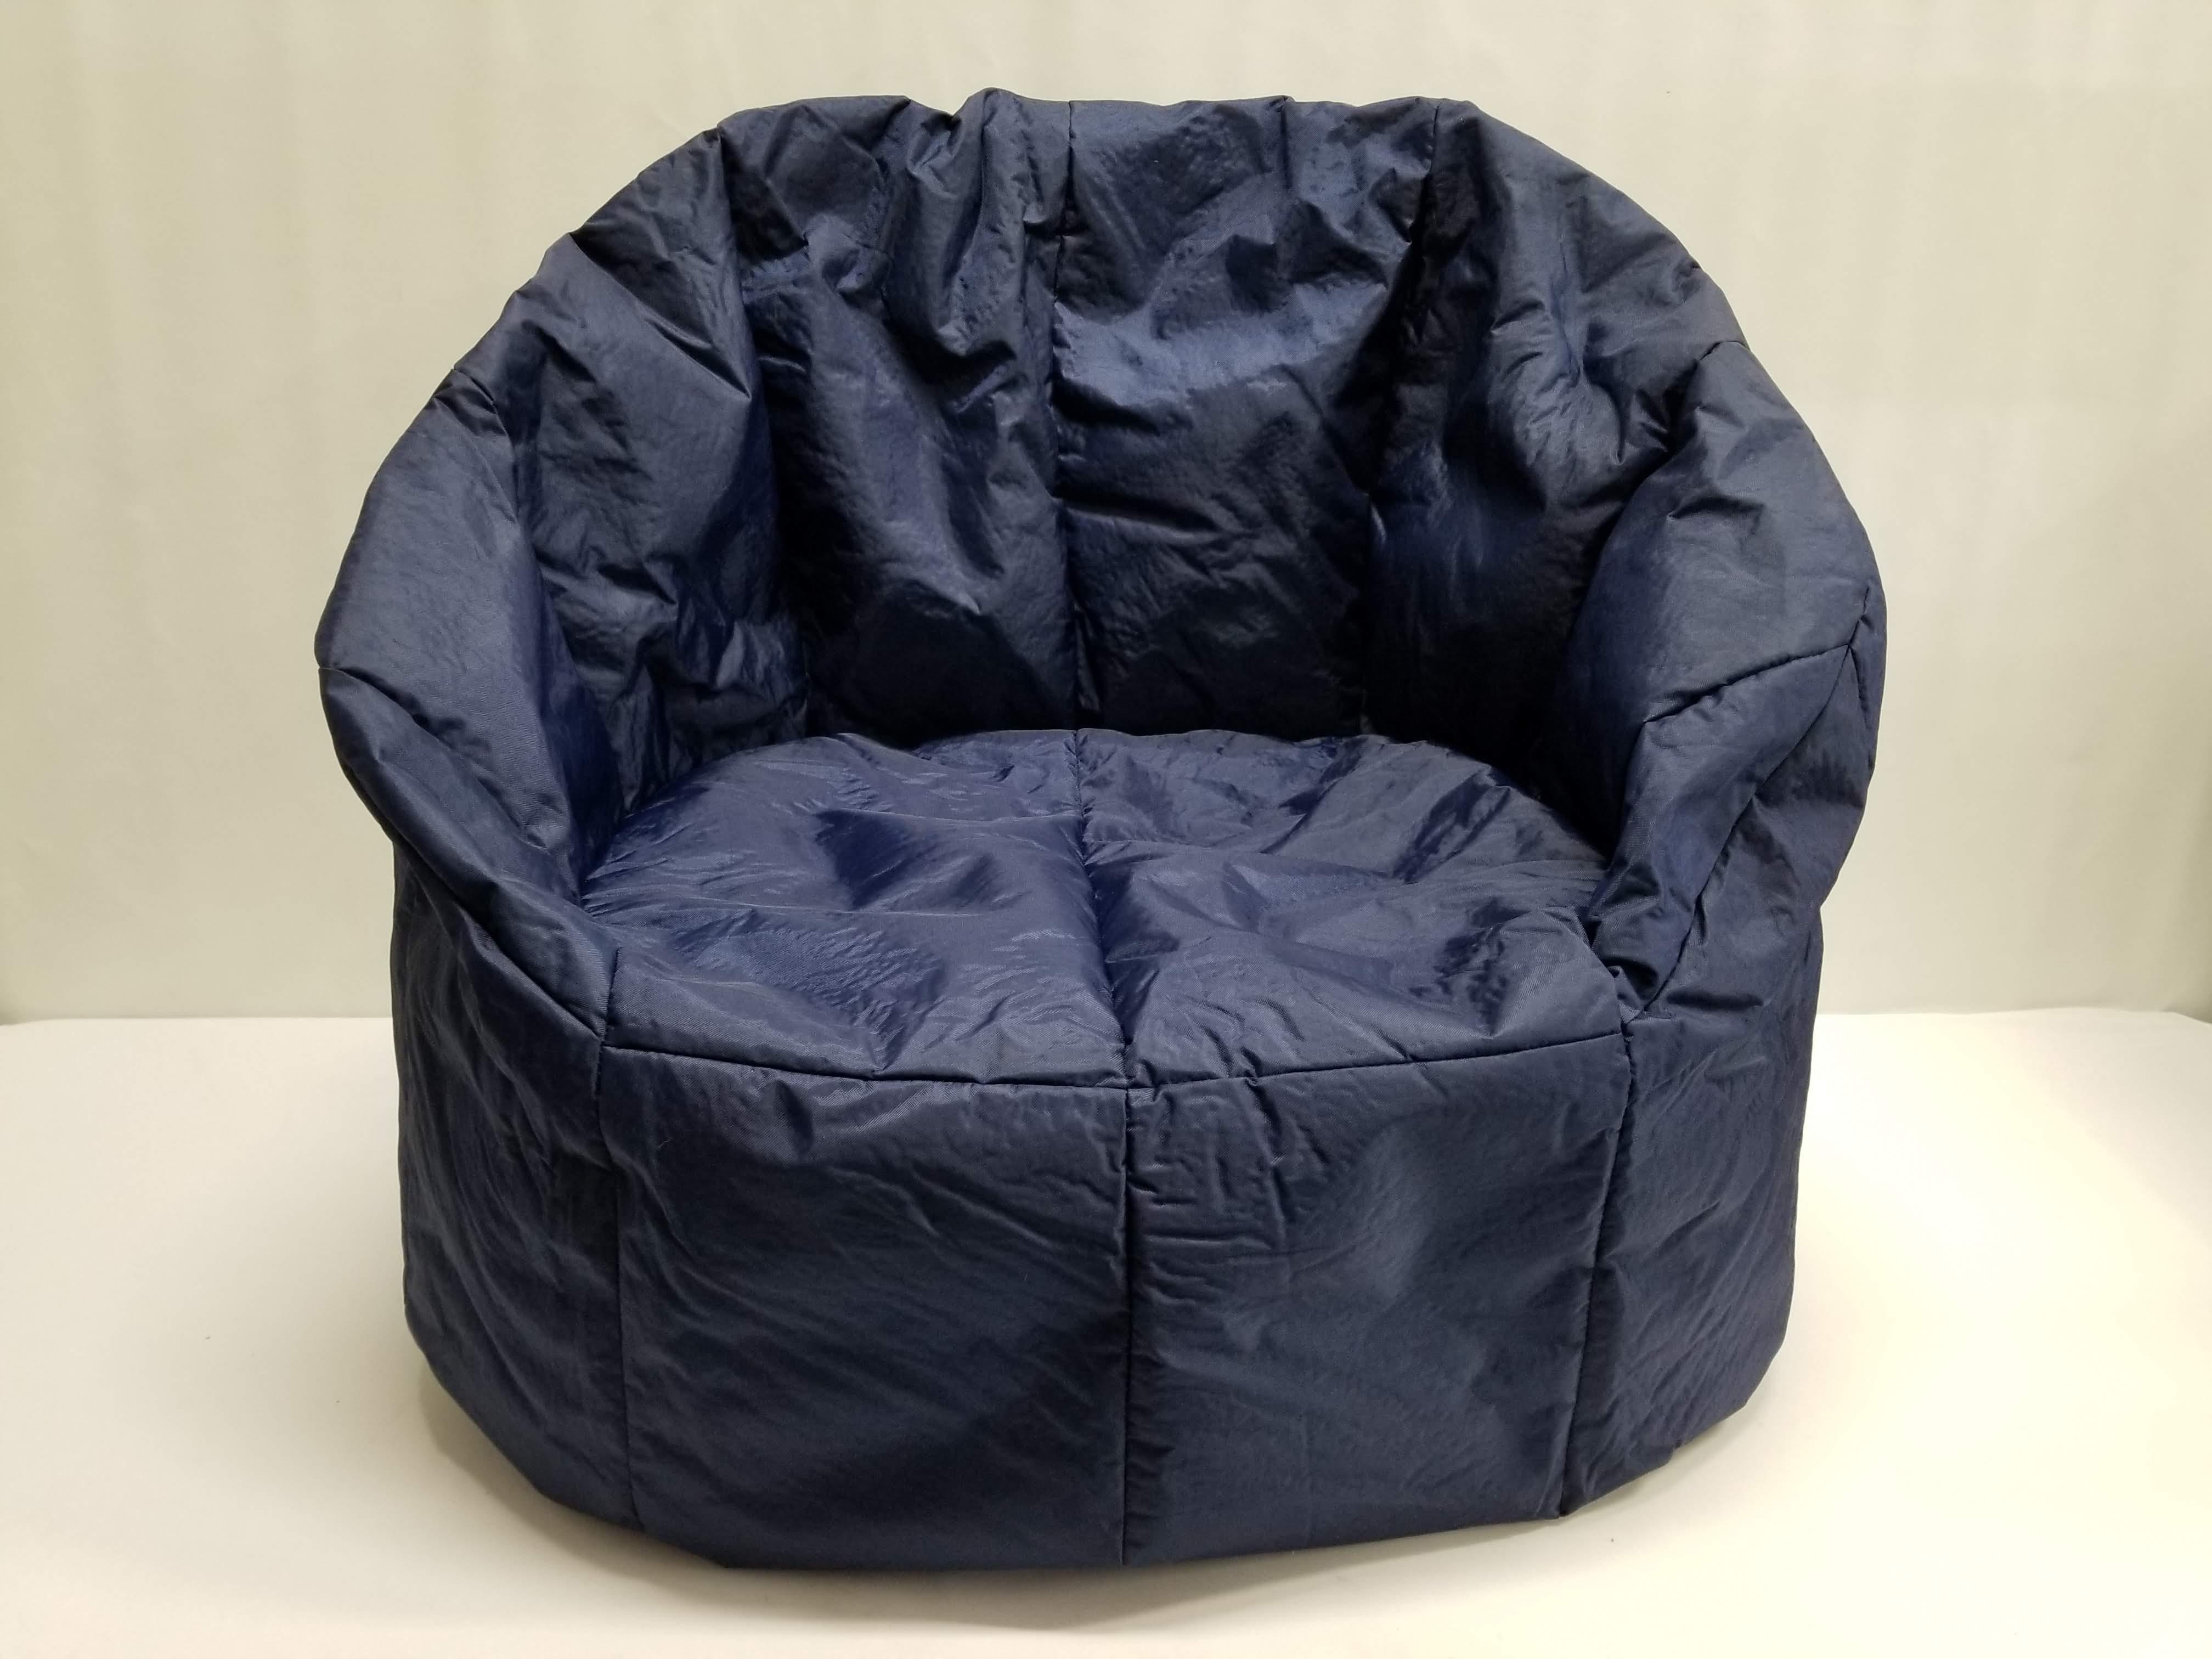 Incredible Big Joe Milano Bean Bag Chair Navy Blue Open Box New Creativecarmelina Interior Chair Design Creativecarmelinacom